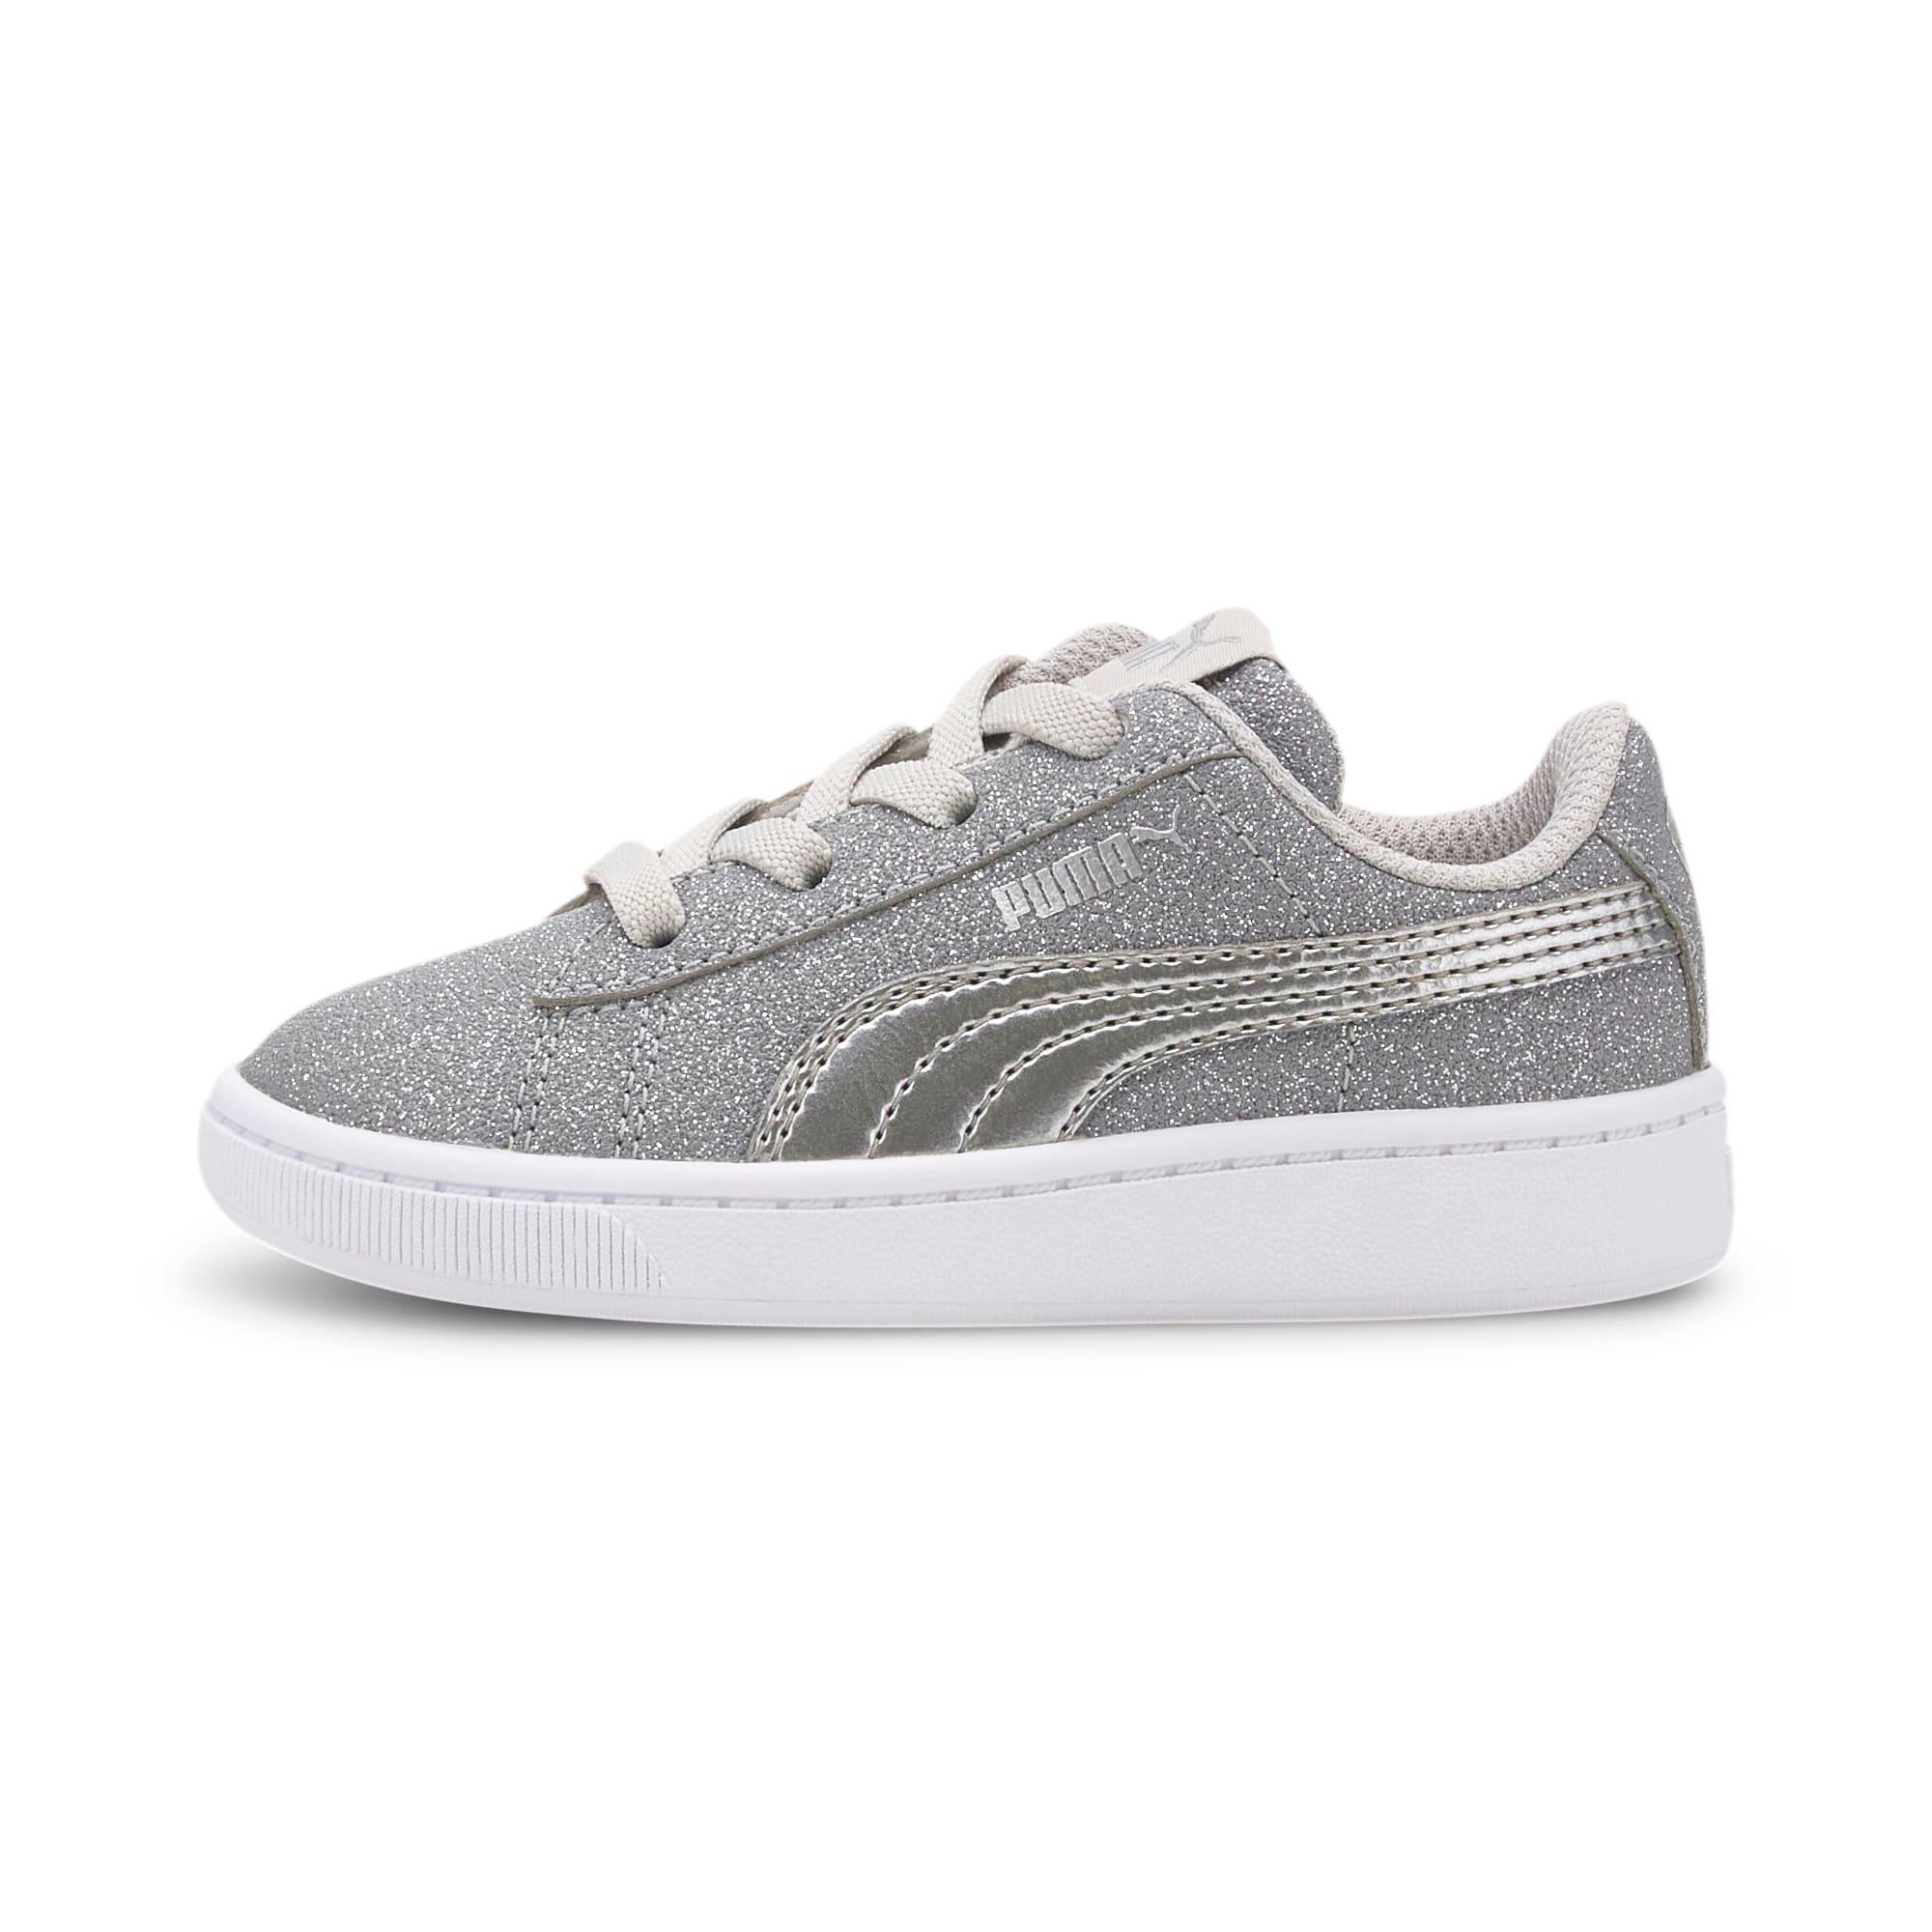 Thumbnail 1 of PUMA Vikky v2 Glitz AC Sneakers INF, Gray Violet-Silver-White, medium